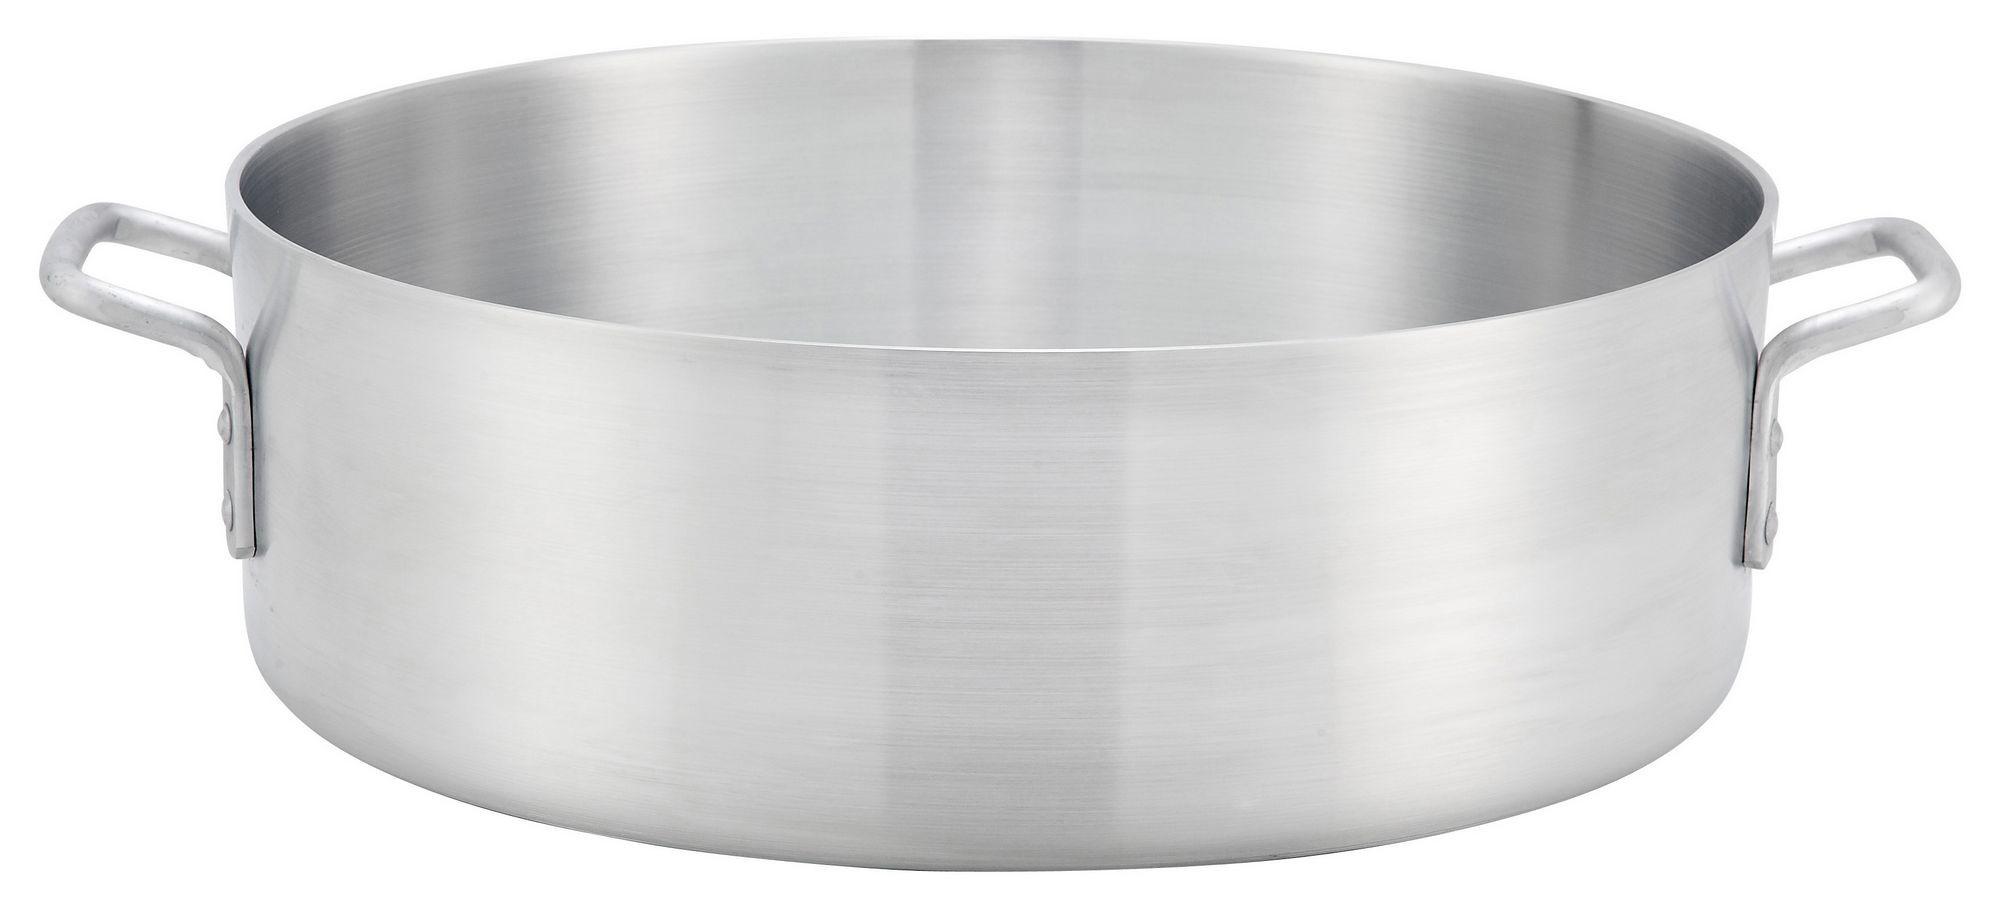 Win-Ware Reinforced-Rim 40-Quart 4.0 mm Aluminum Brazier